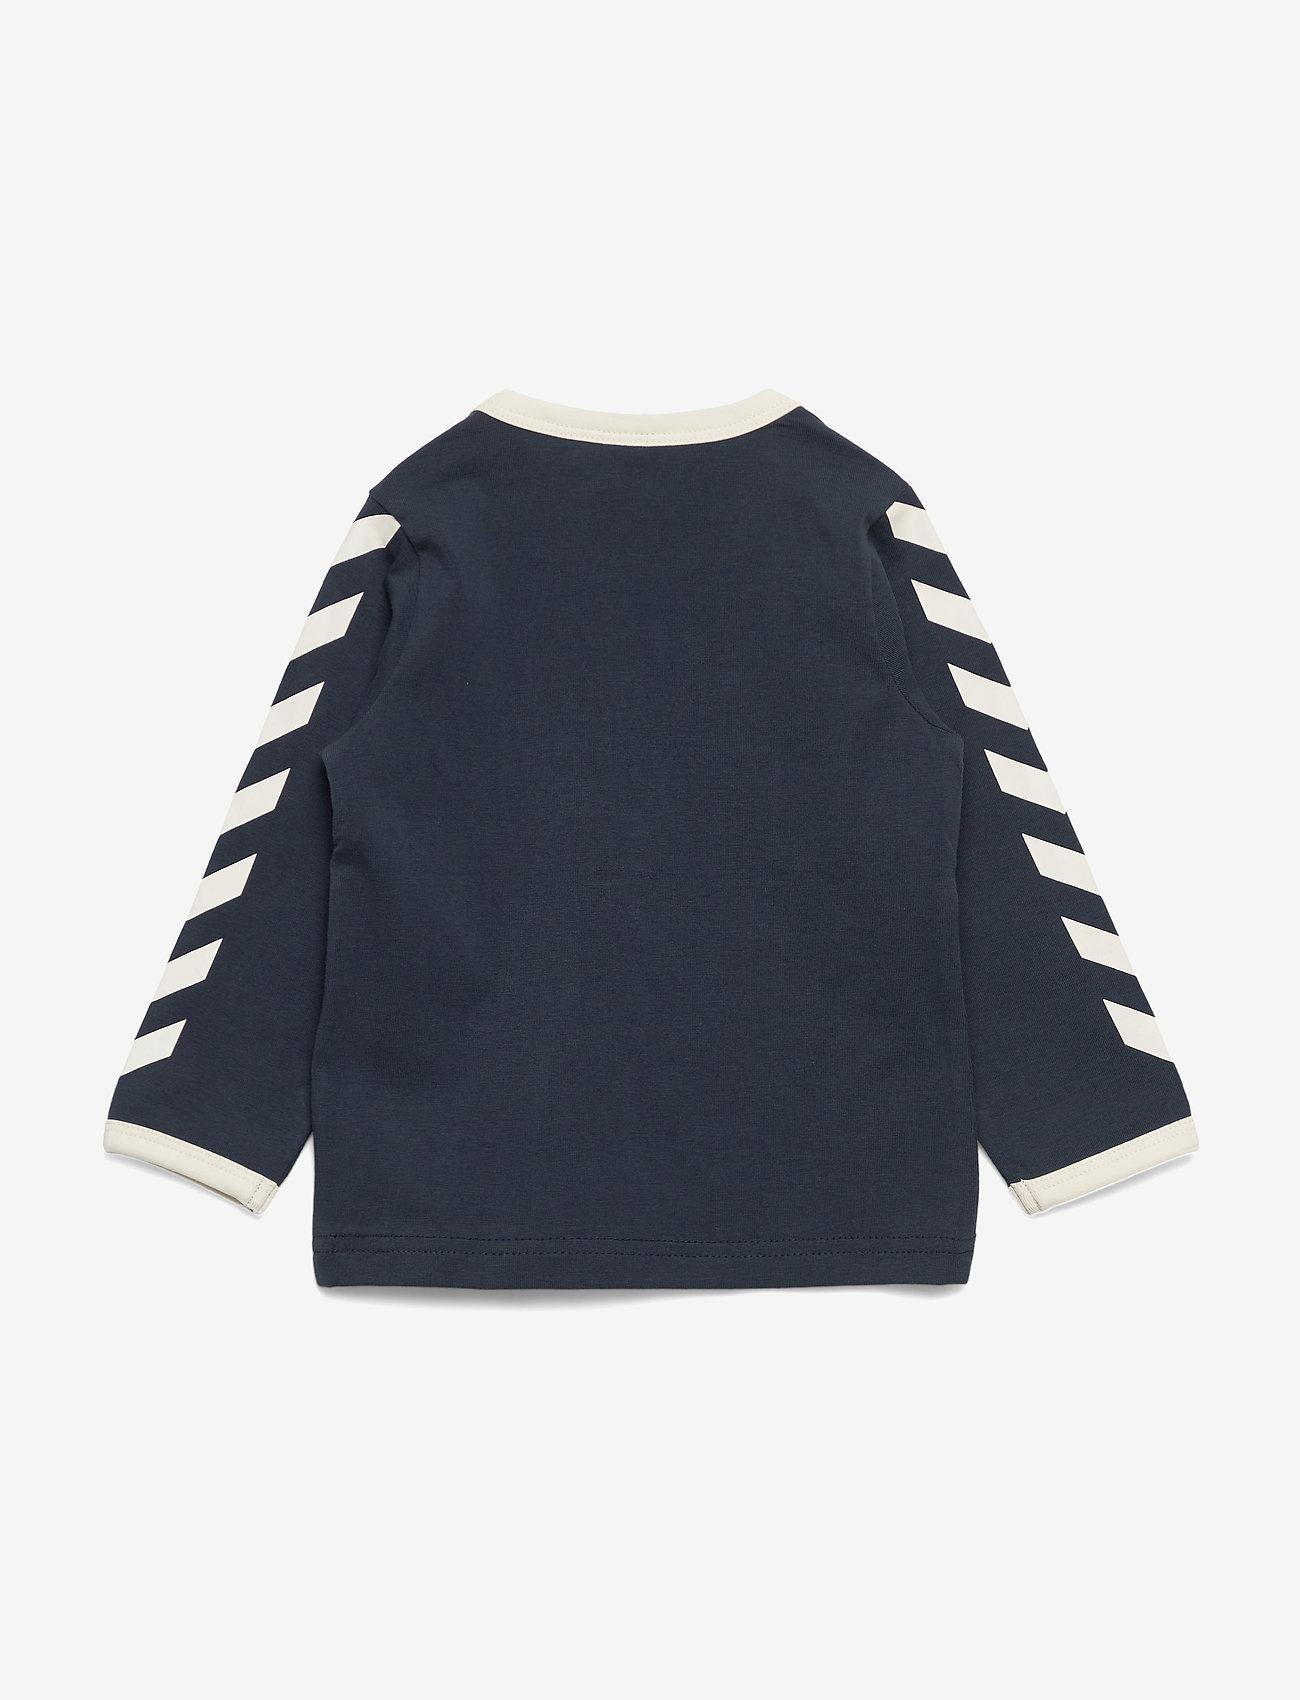 Hummel - hmlFLIPPER T-SHIRT L/S - long-sleeved t-shirts - blue nights - 1